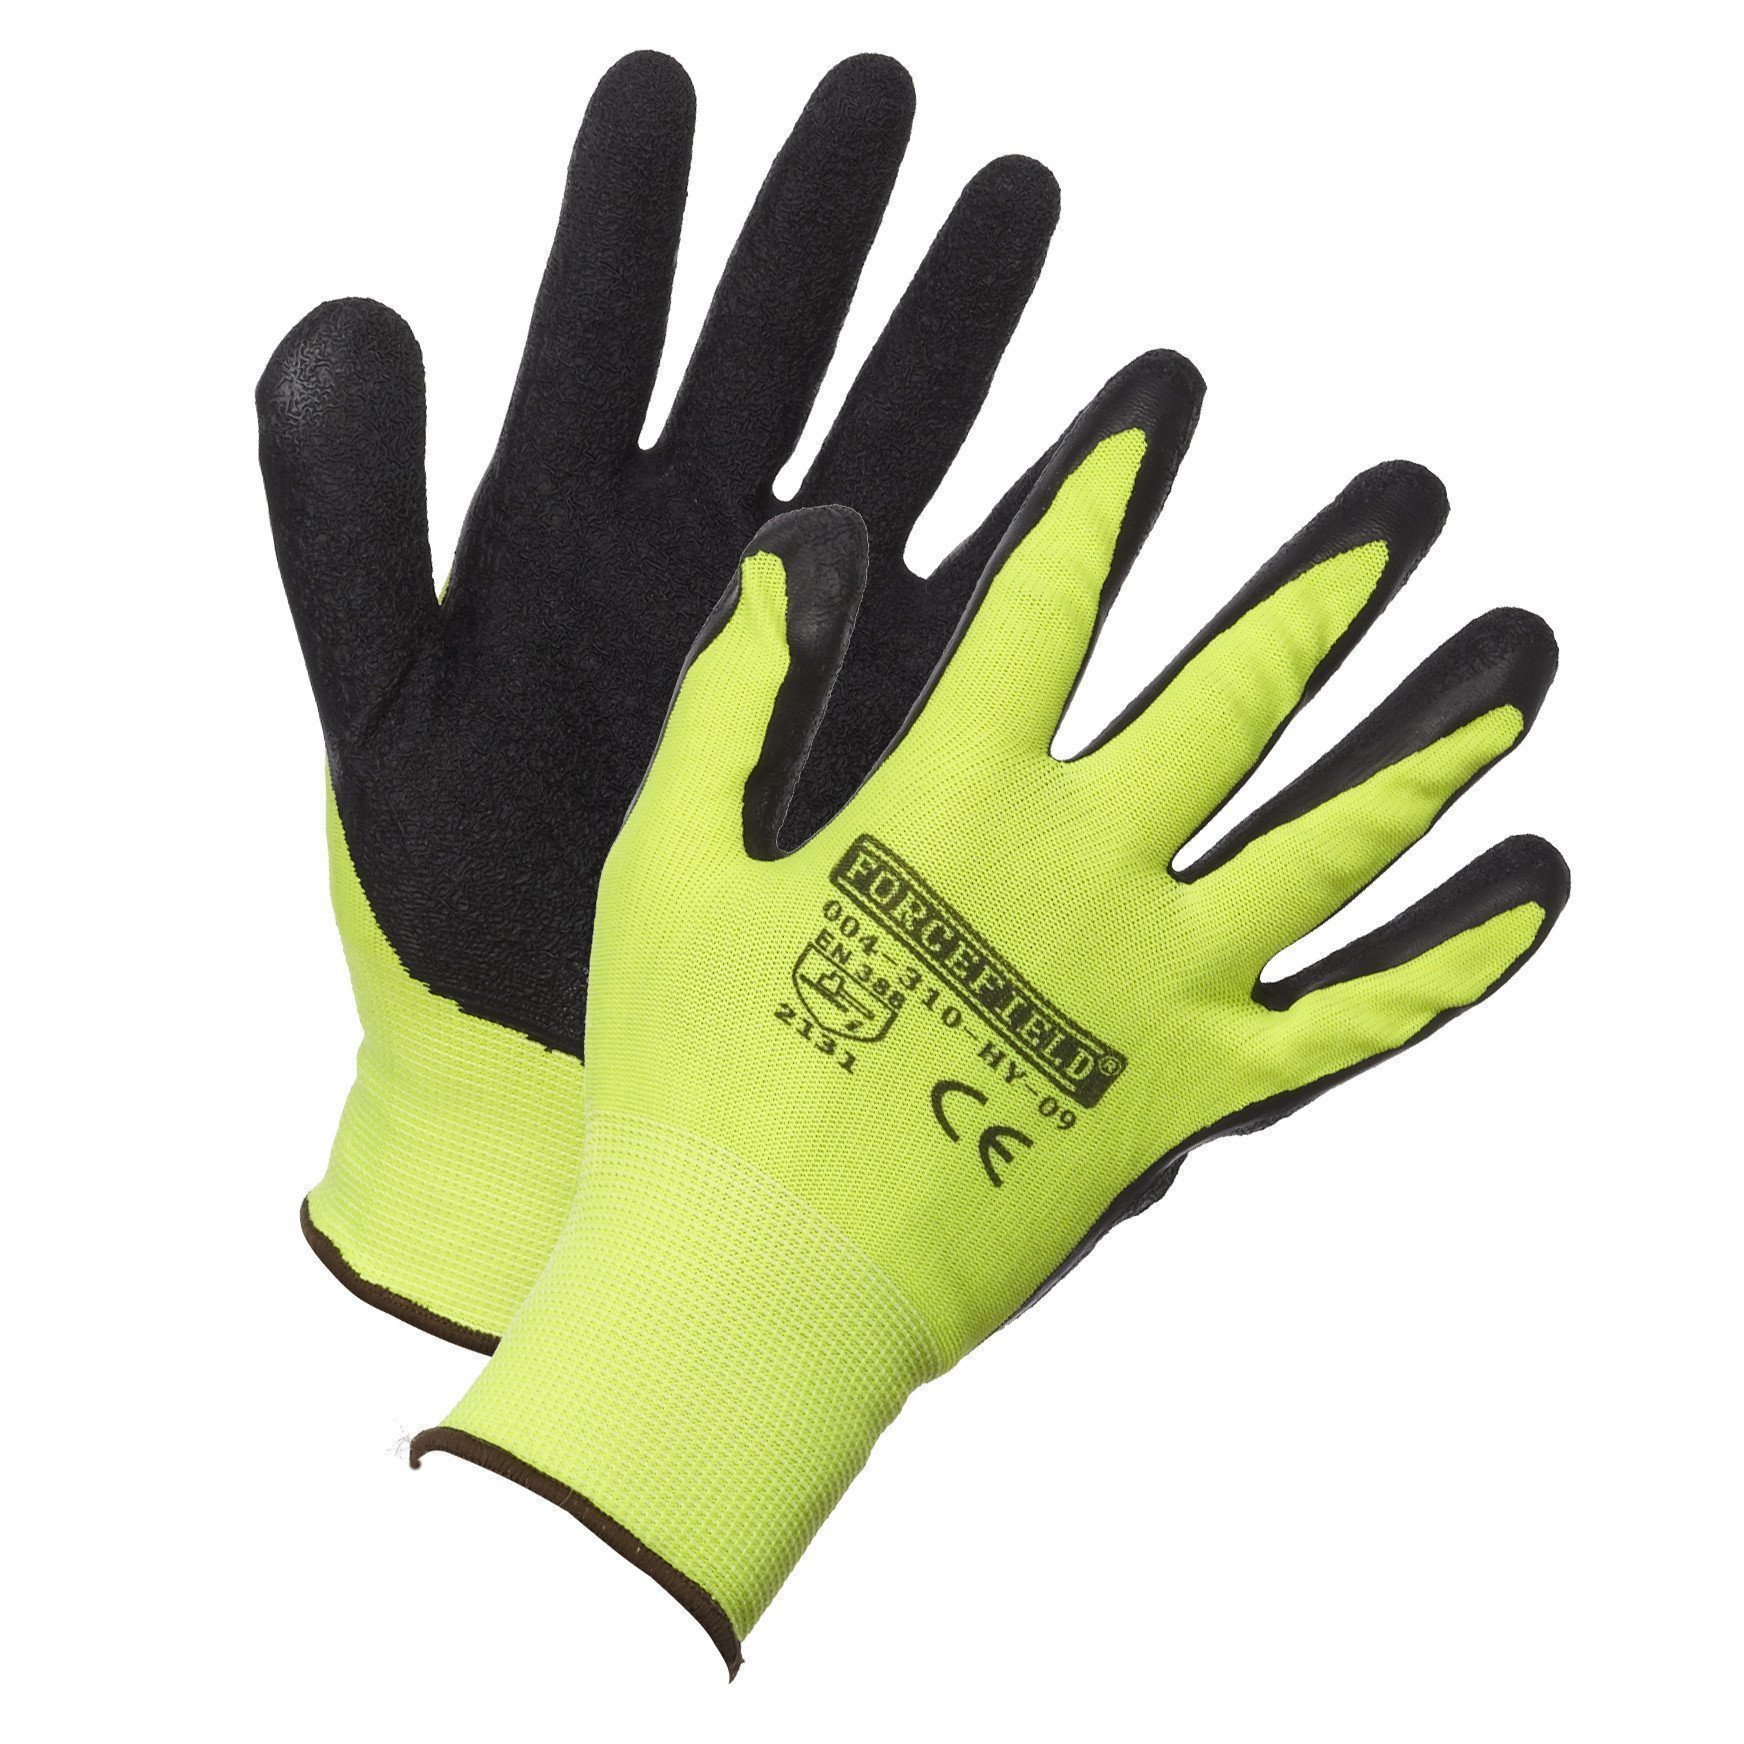 Gloves - Forcefield -HI VIS (Size 7), 004-310-HY-07